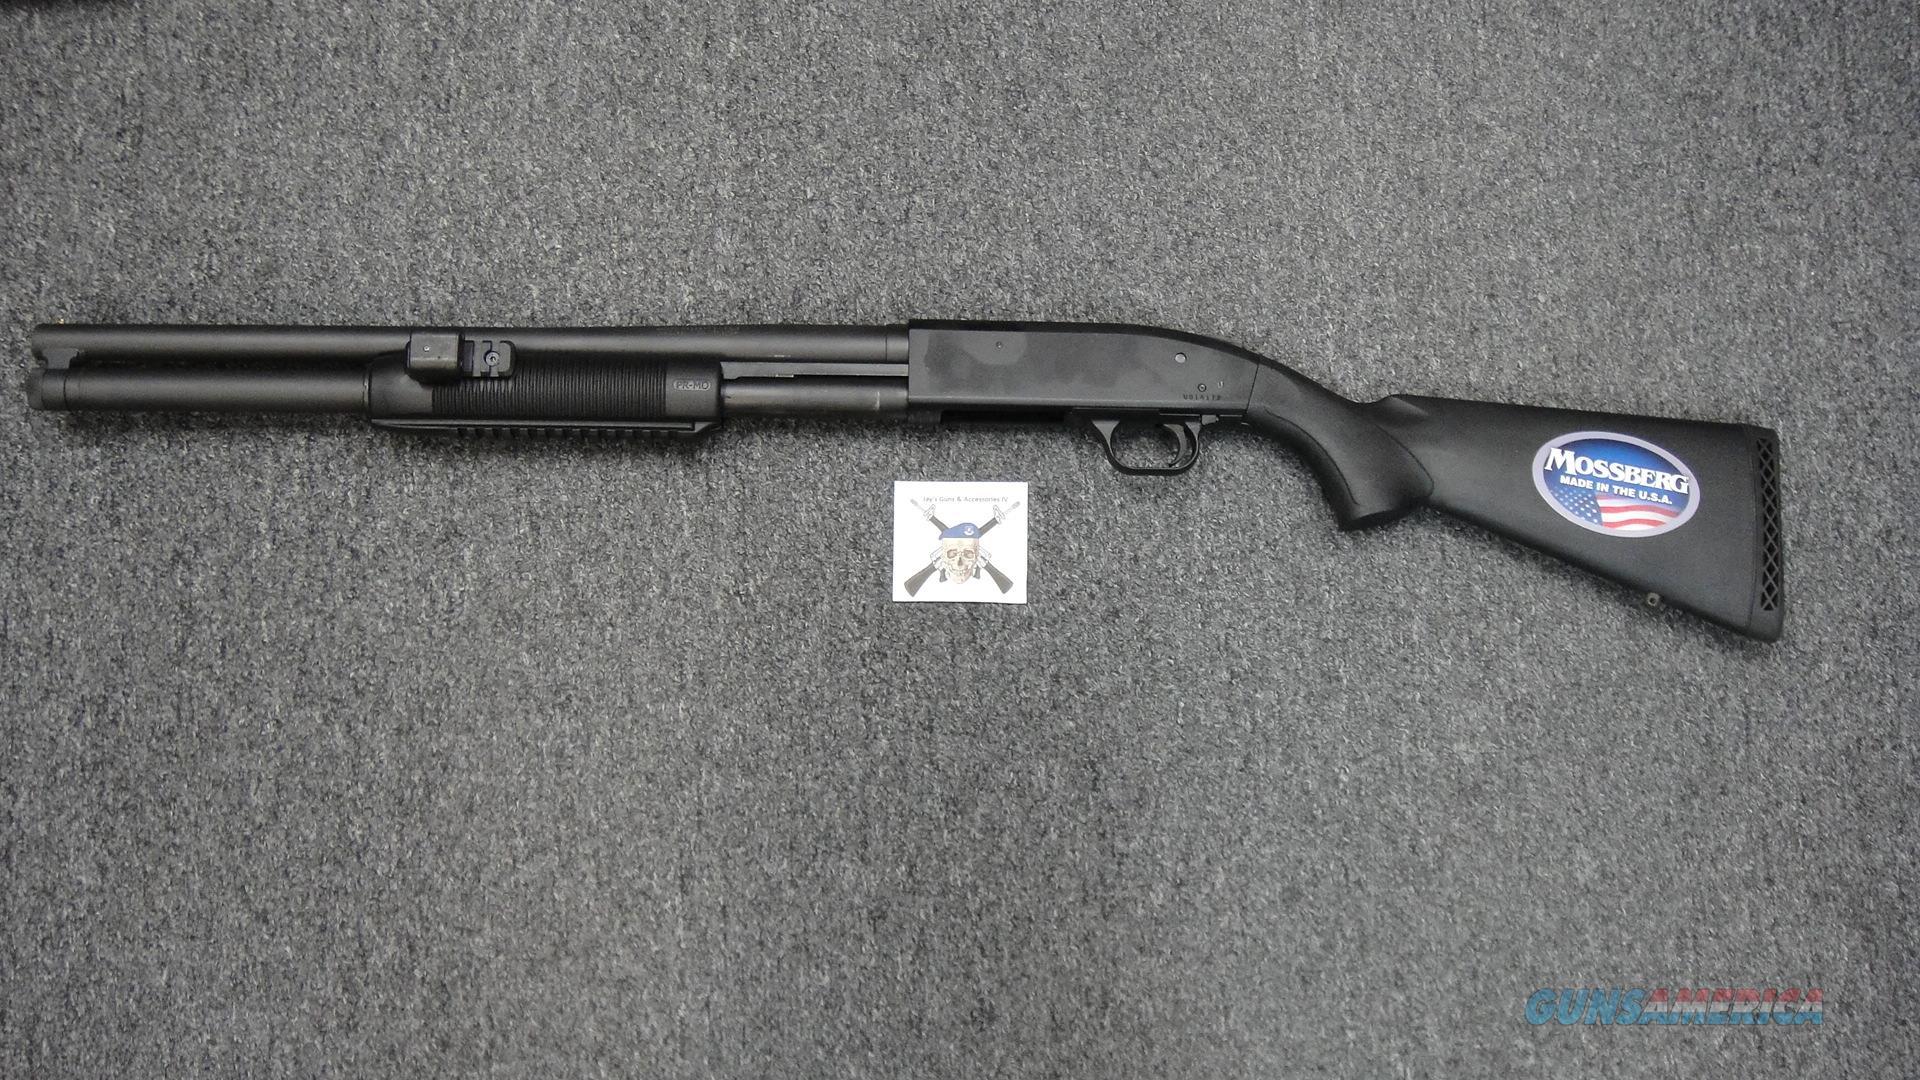 Mossberg 500 w/ laser  Guns > Shotguns > Mossberg Shotguns > Pump > Tactical